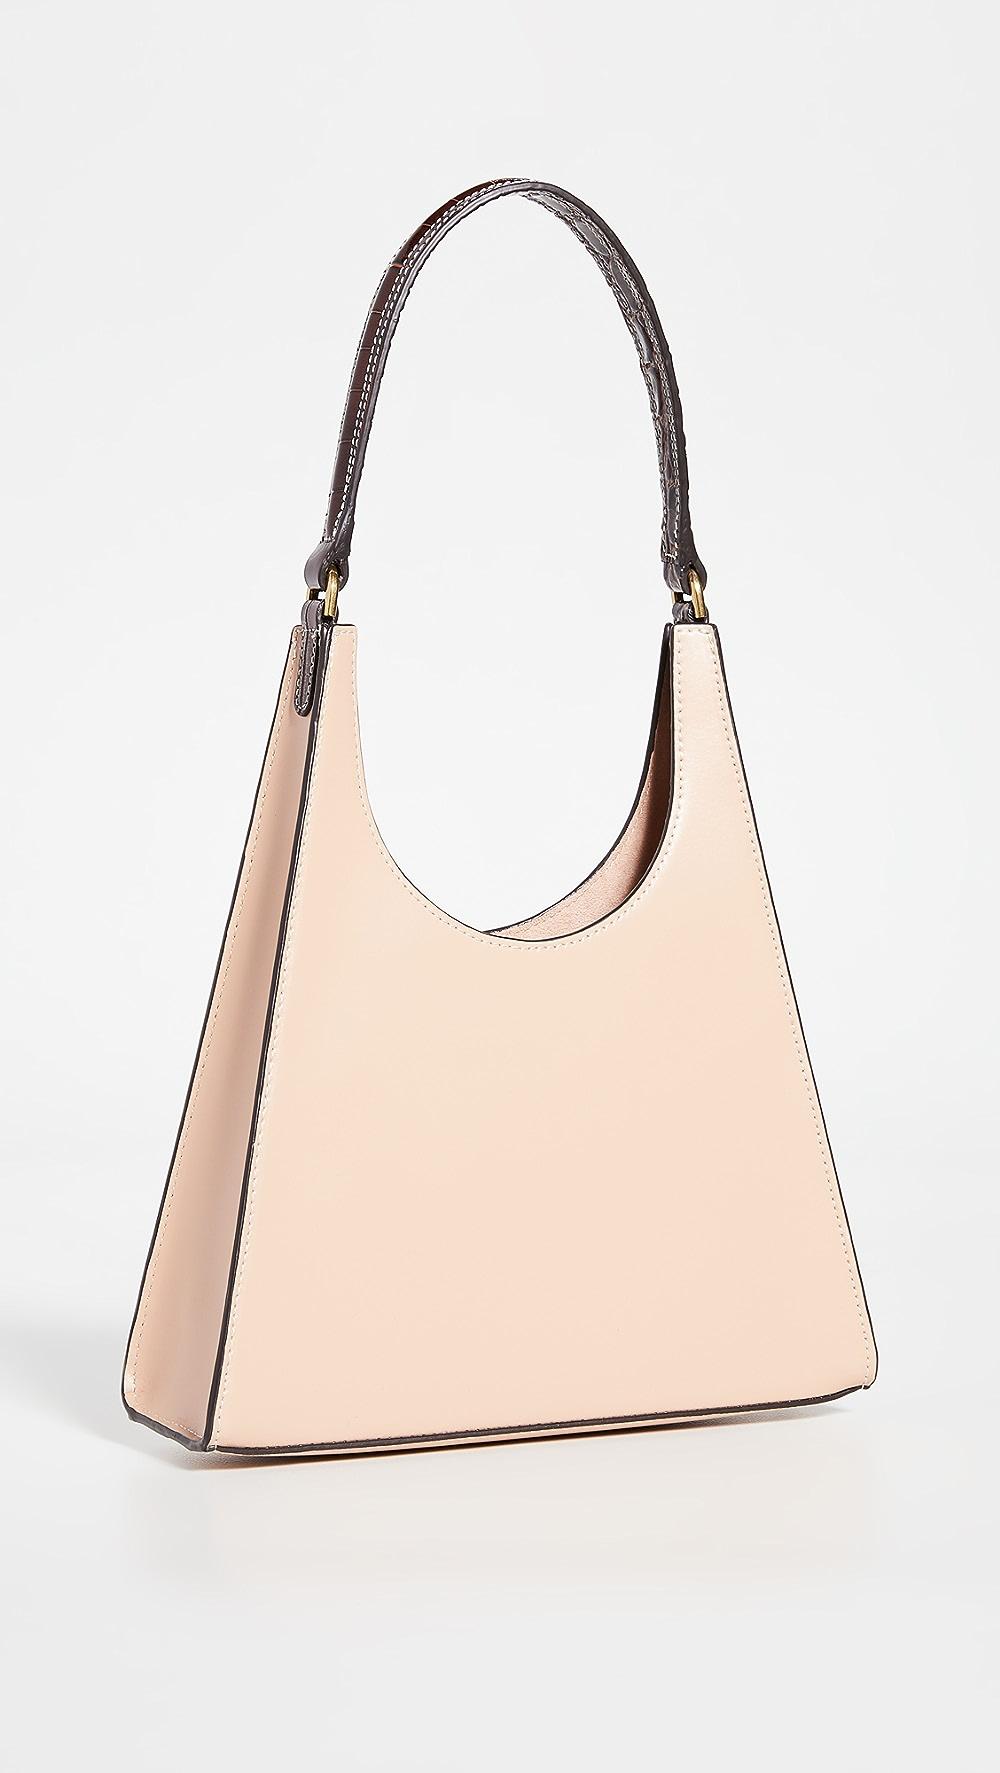 2019 Fashion Staud - Rey Bag Terrific Value